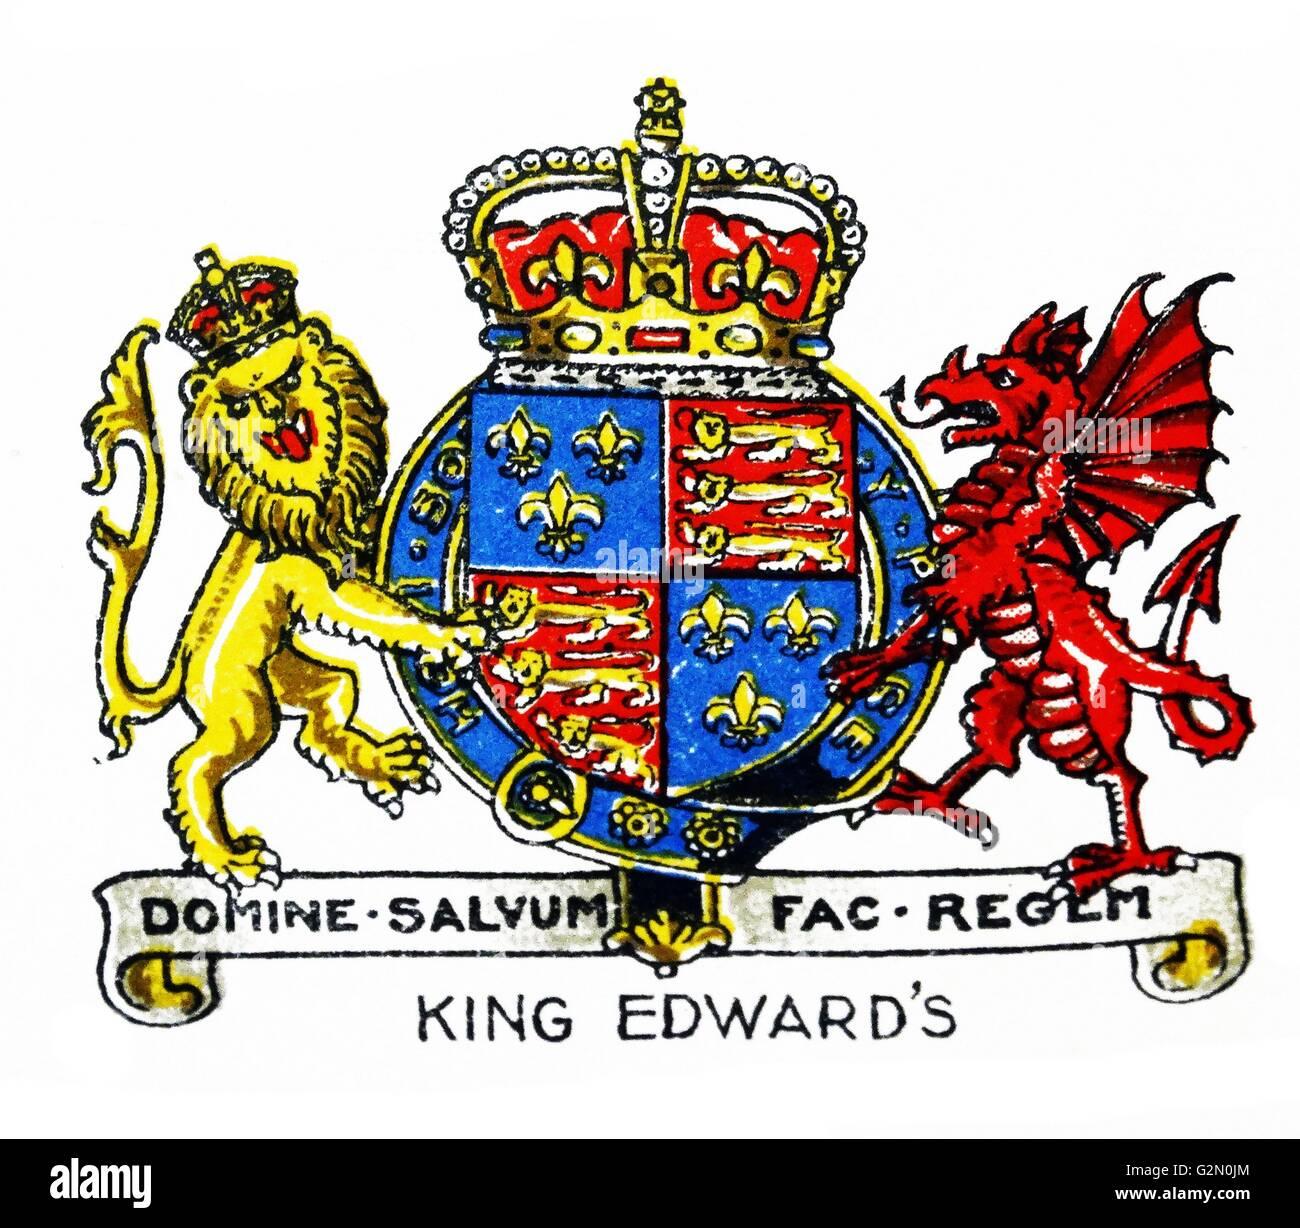 Emblem of King Edward VI School, Bury St Edmunds, Suffolk, England - Stock Image